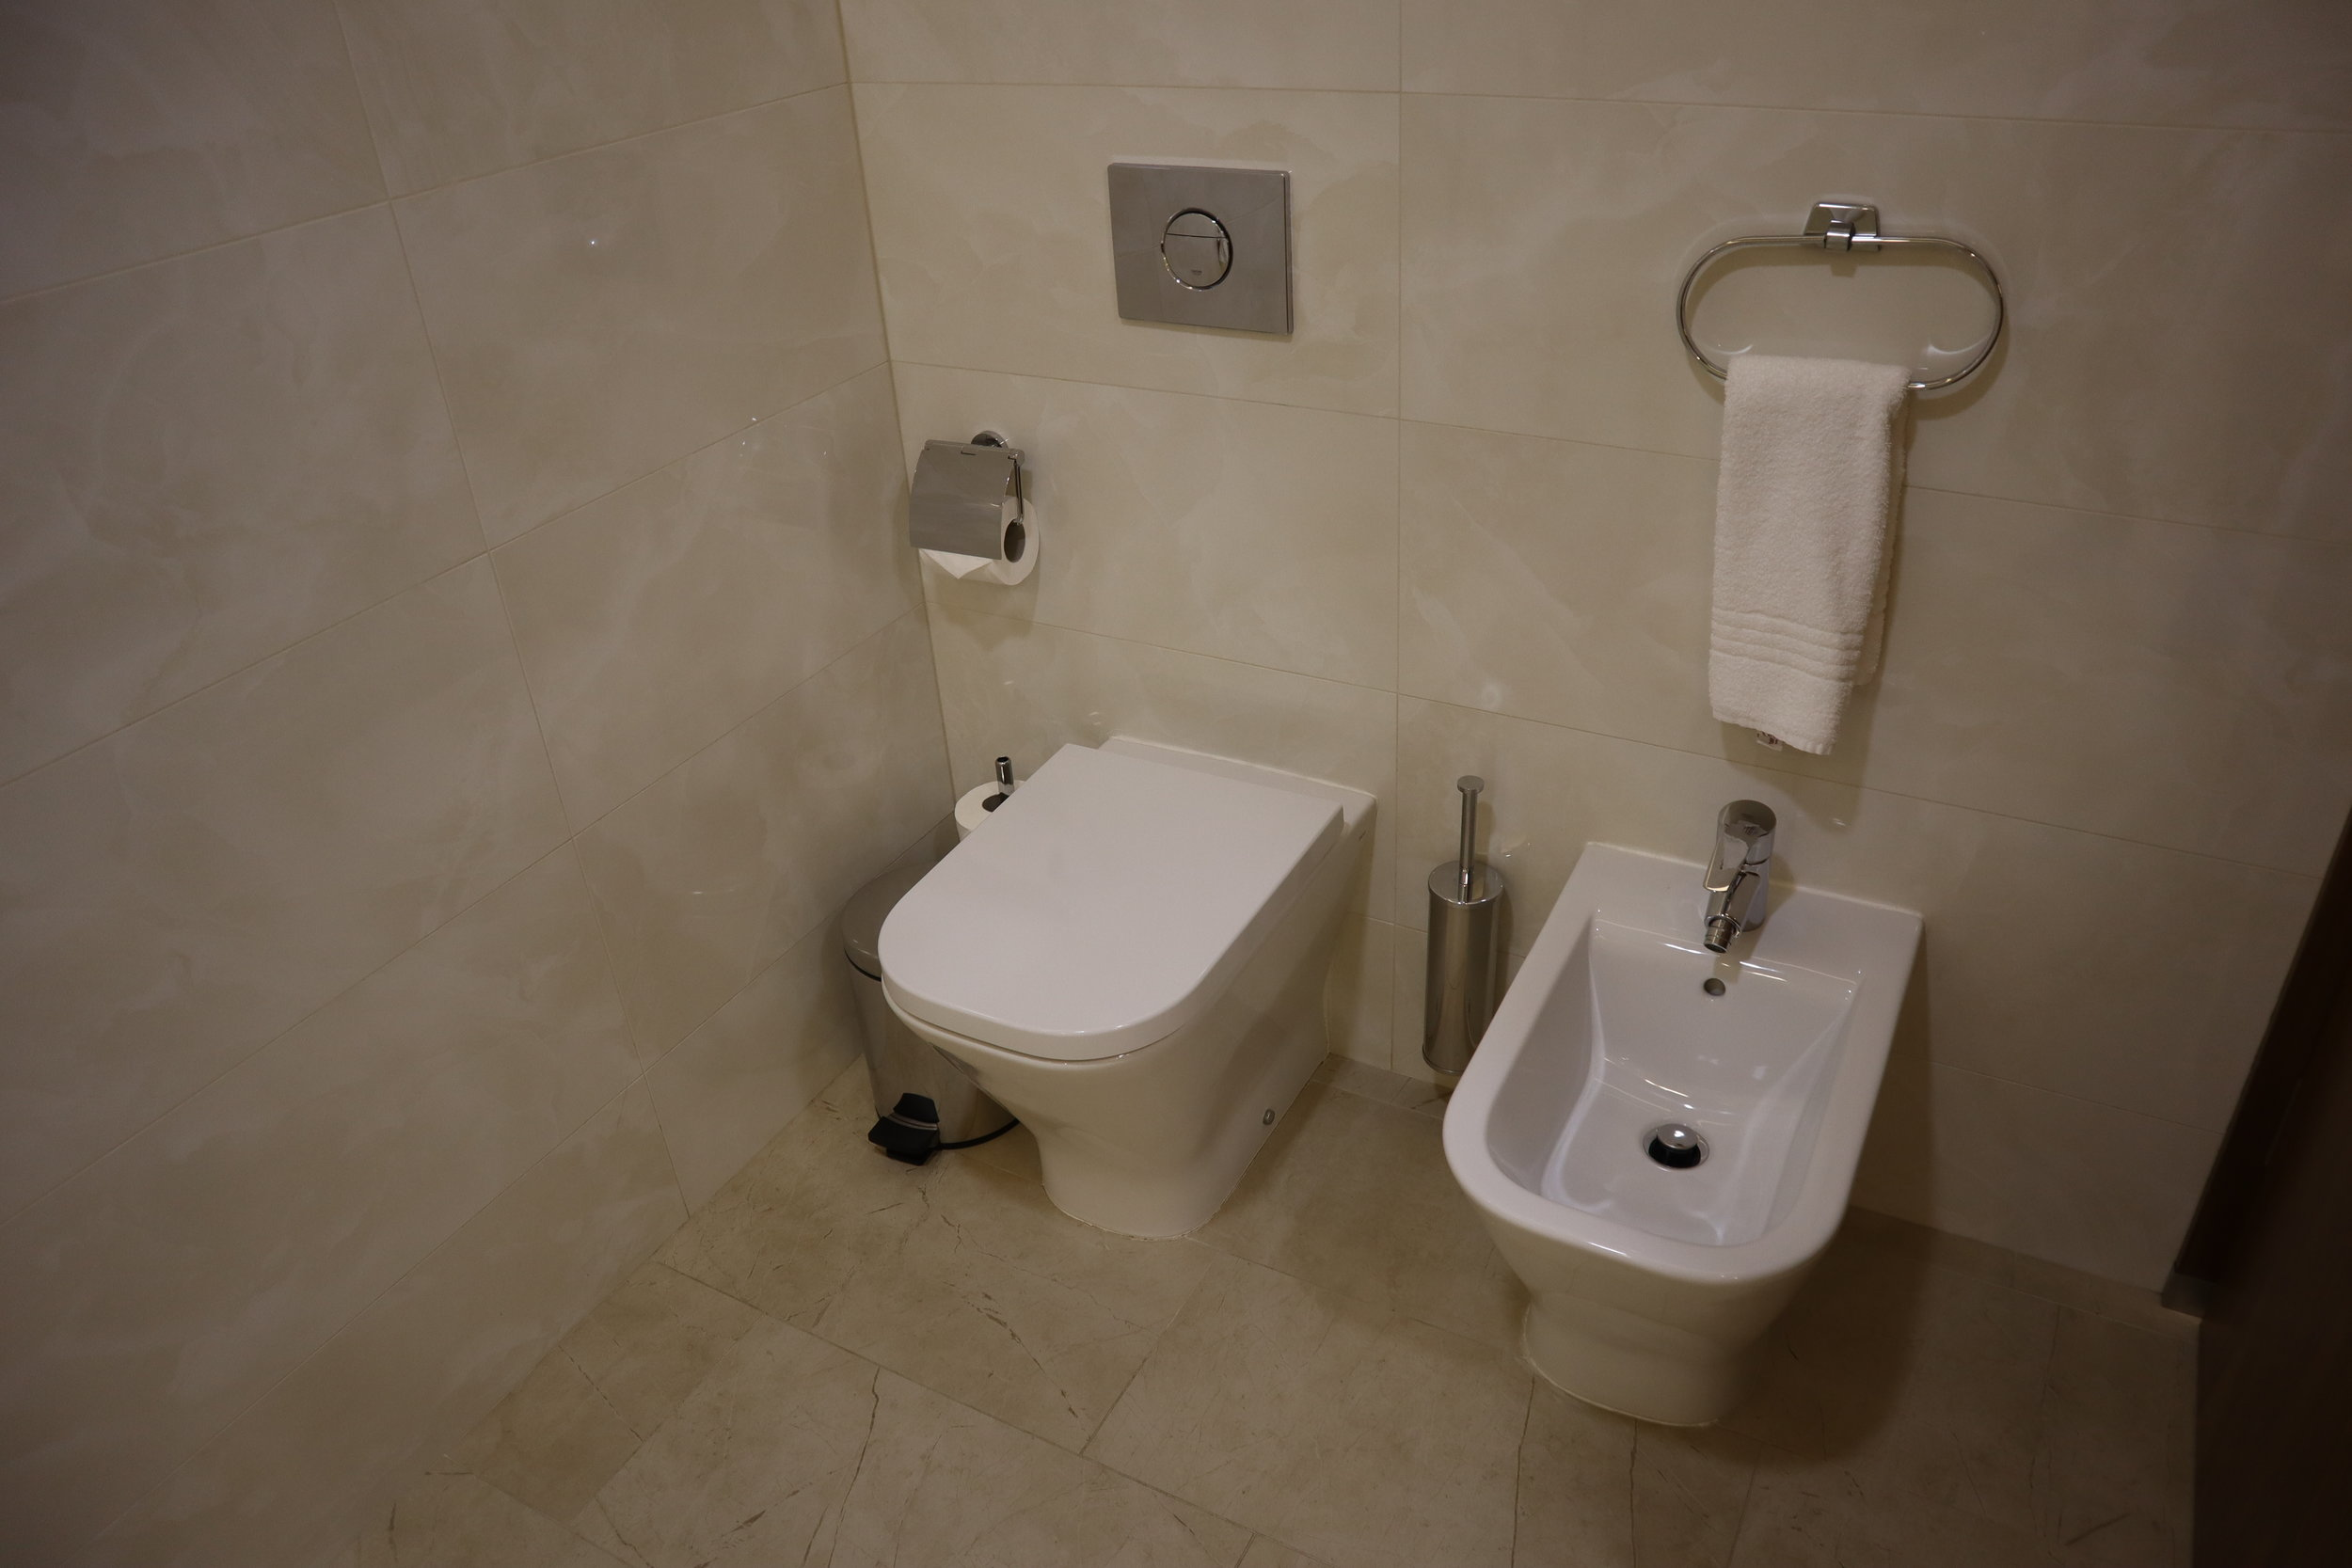 Marriott Novosibirsk – Toilet and bidet